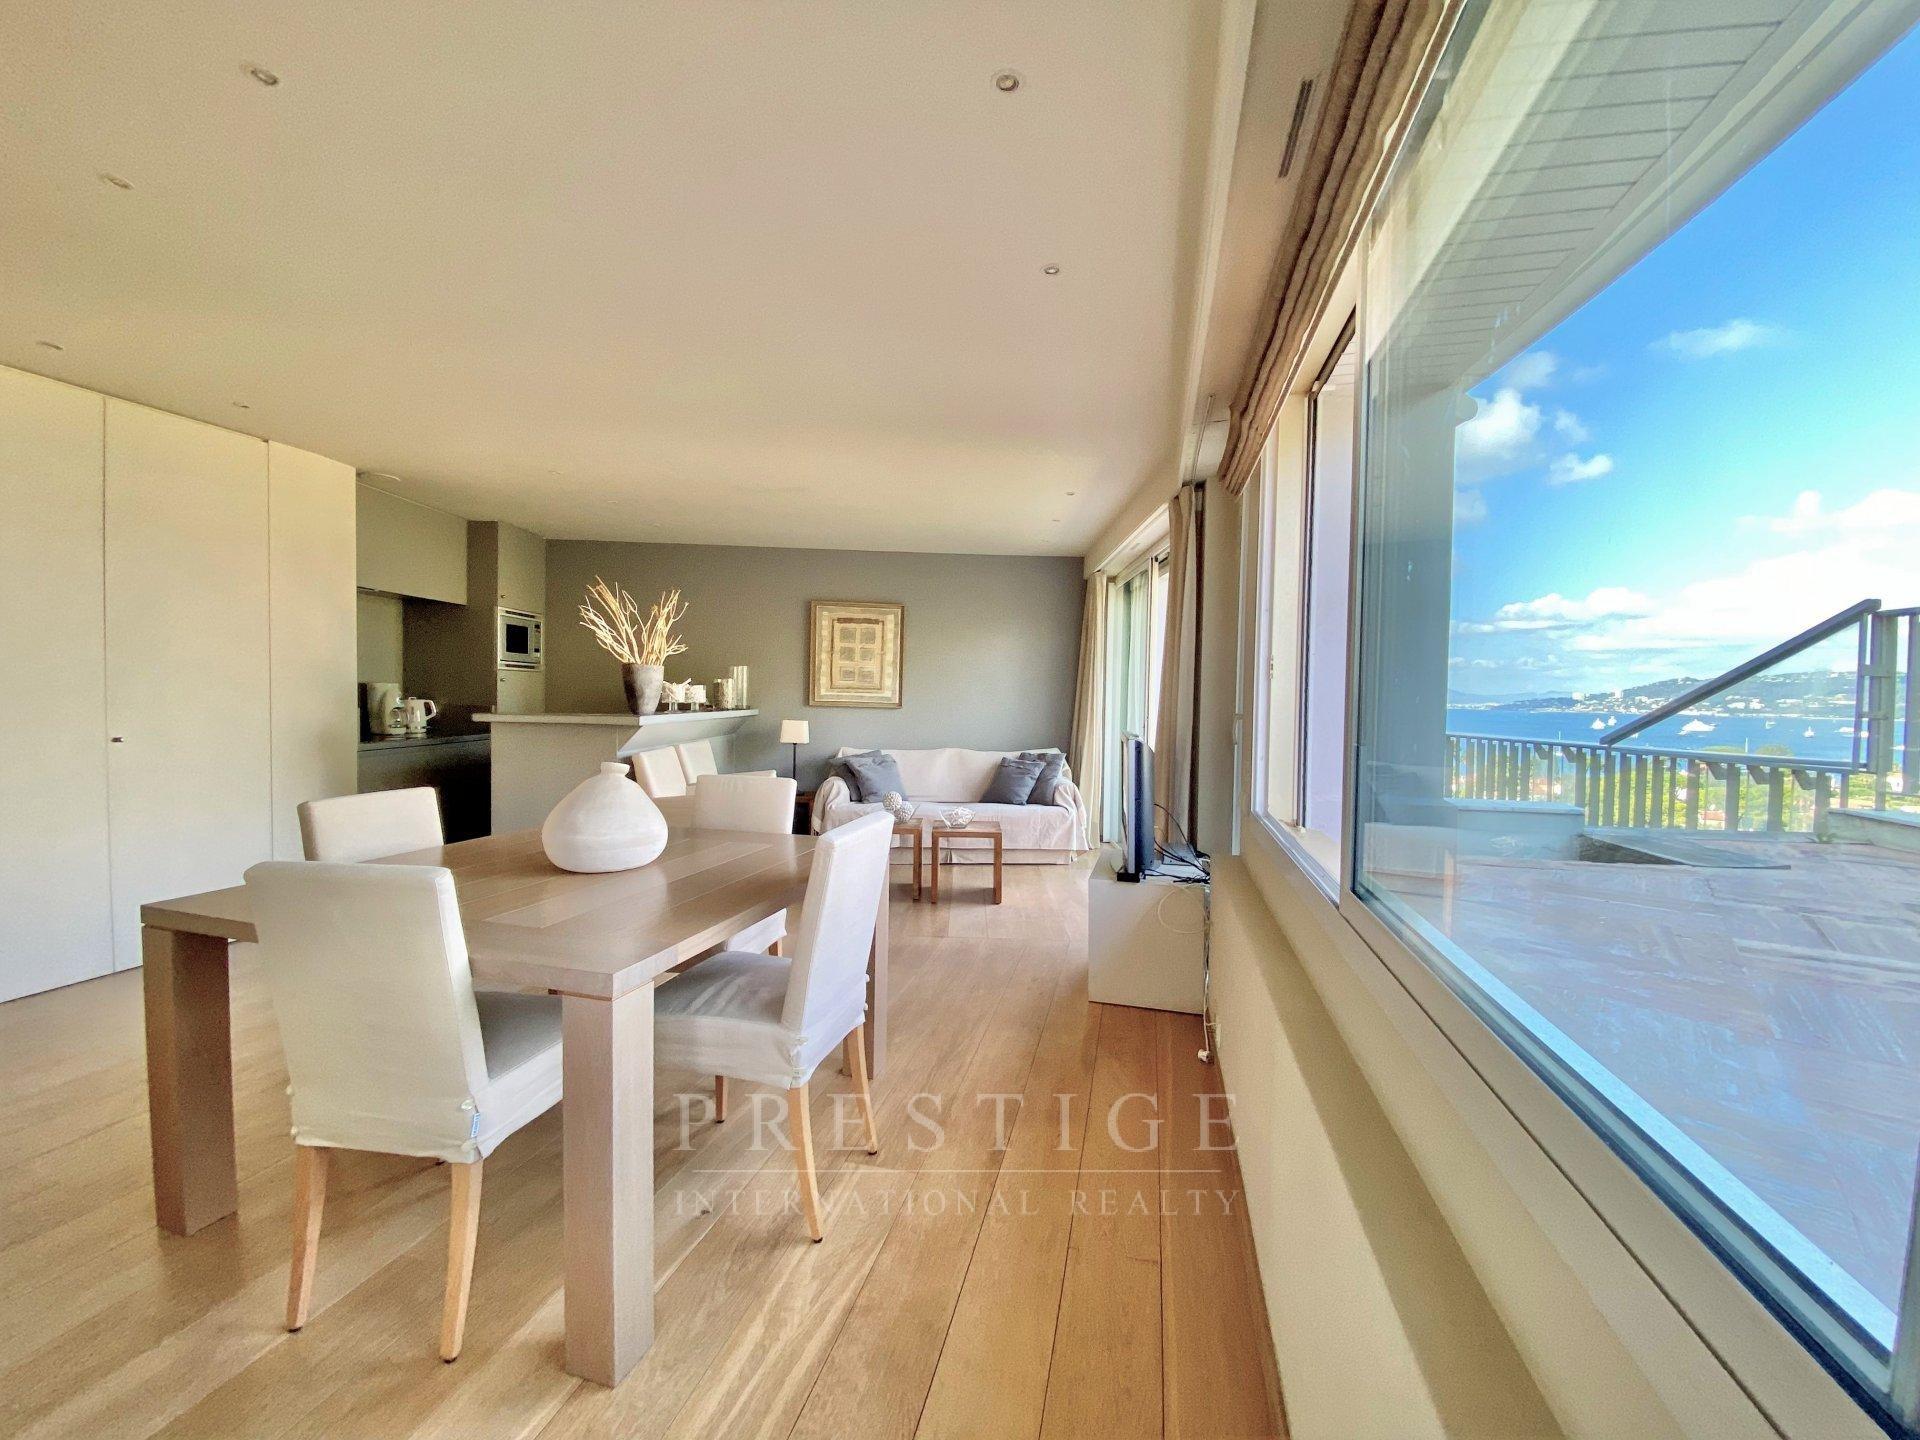 Cap d'Antibes, penthouse vue panoramique mer, piscine & garage